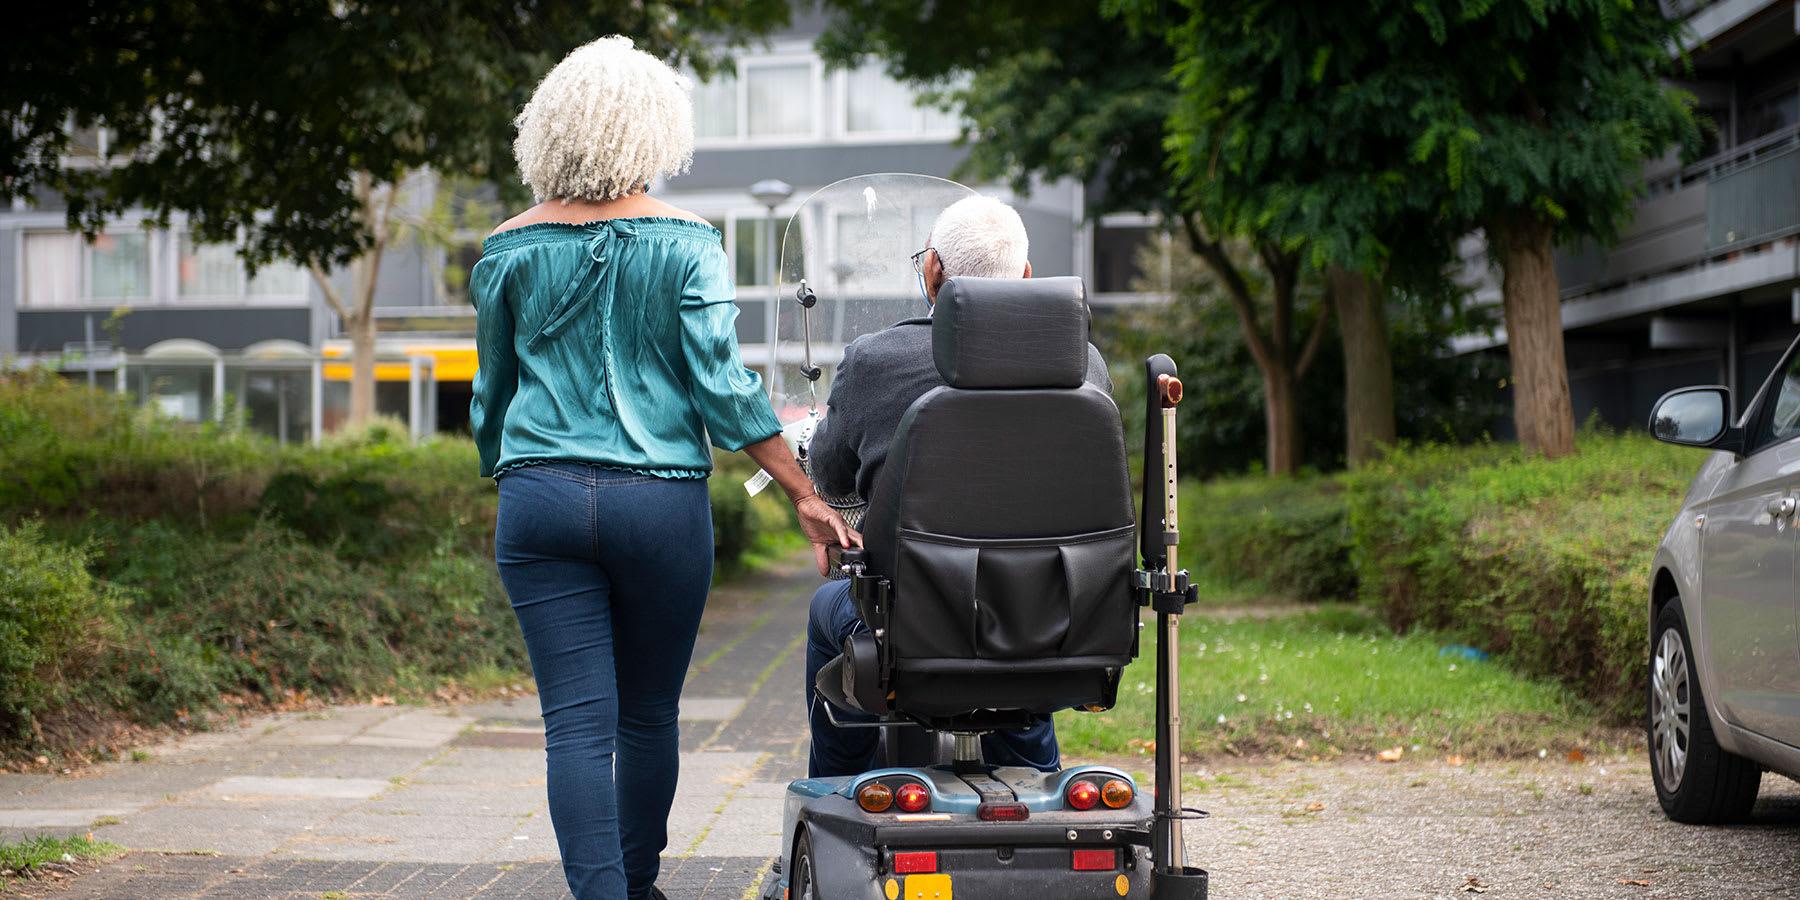 Elder woman walking next to her husband in a motorized wheelchair.